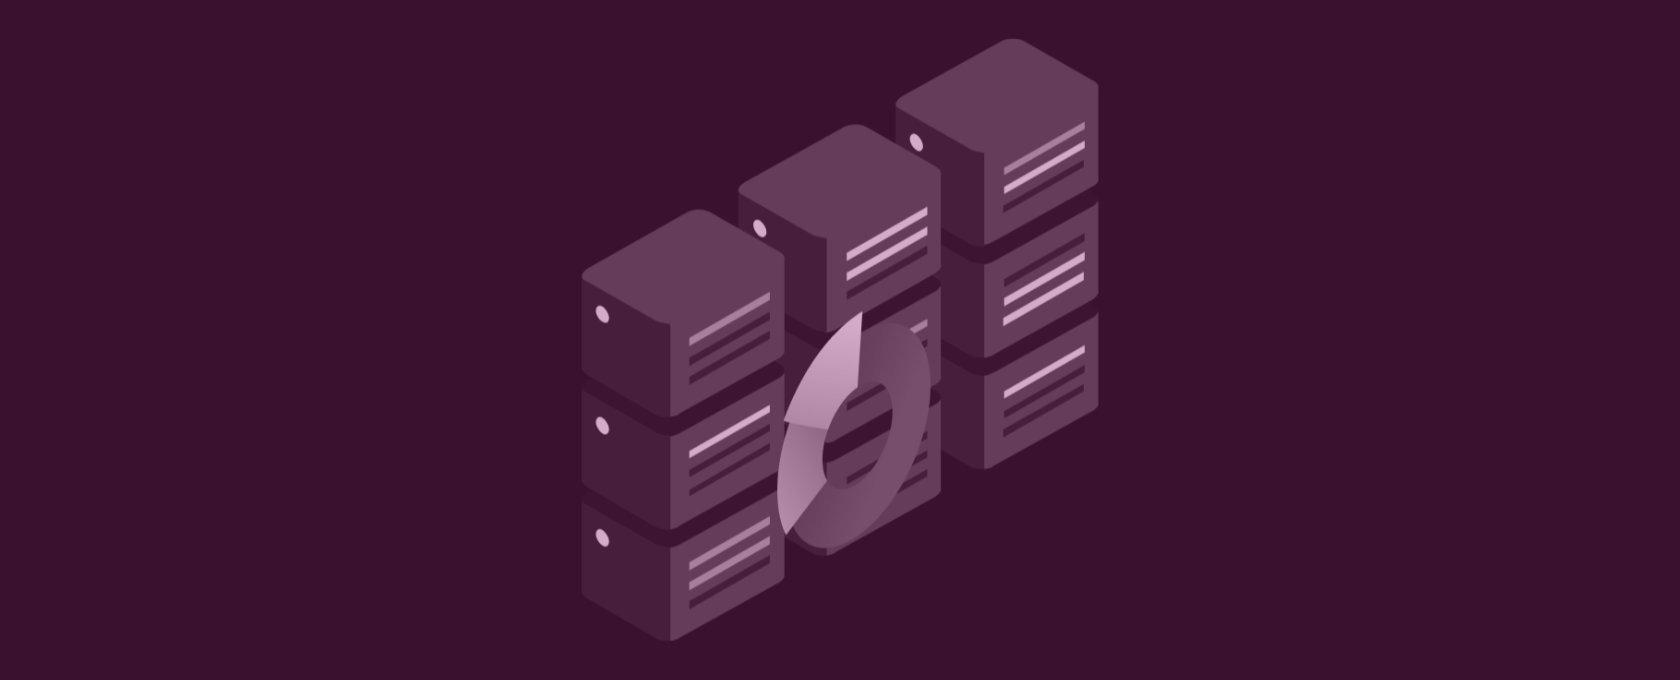 MySQL disaster recovery